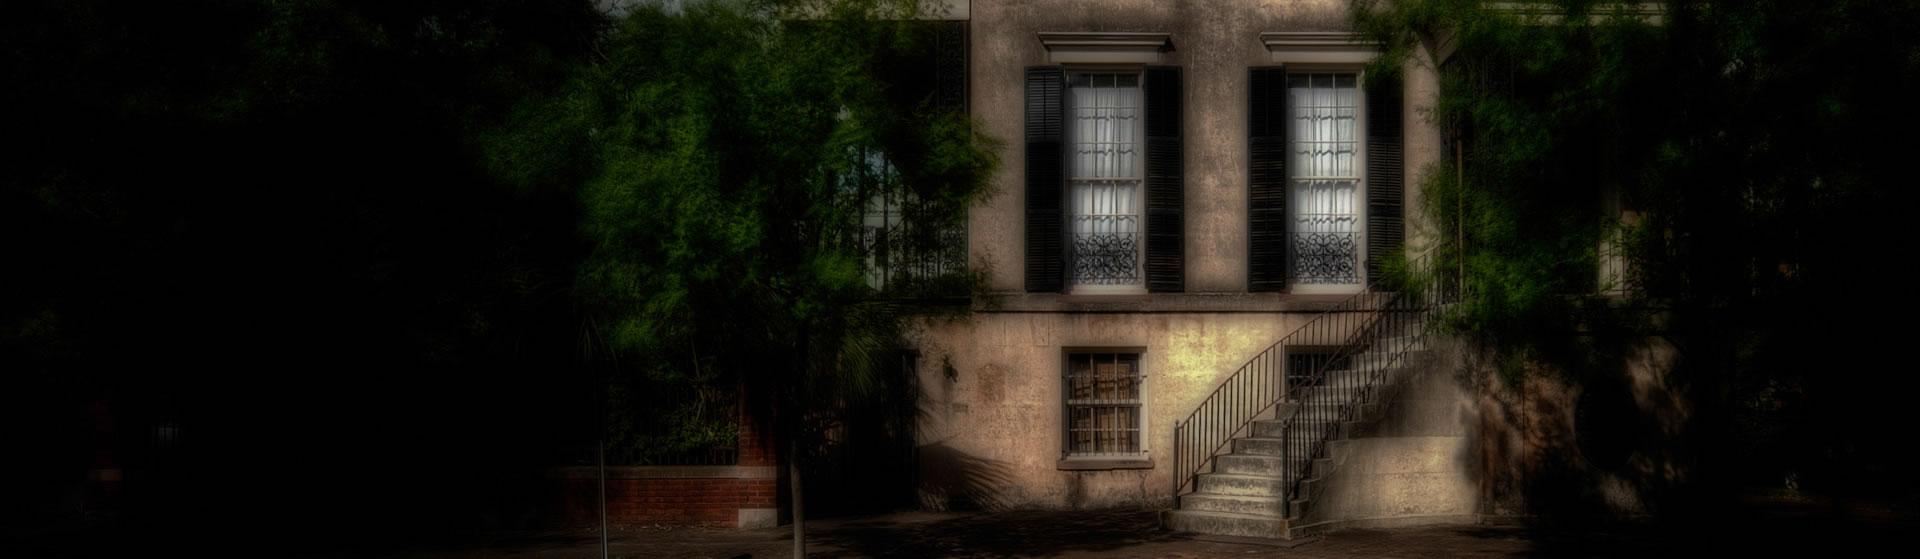 432 Abercorn, Haunted Houses in Savannah